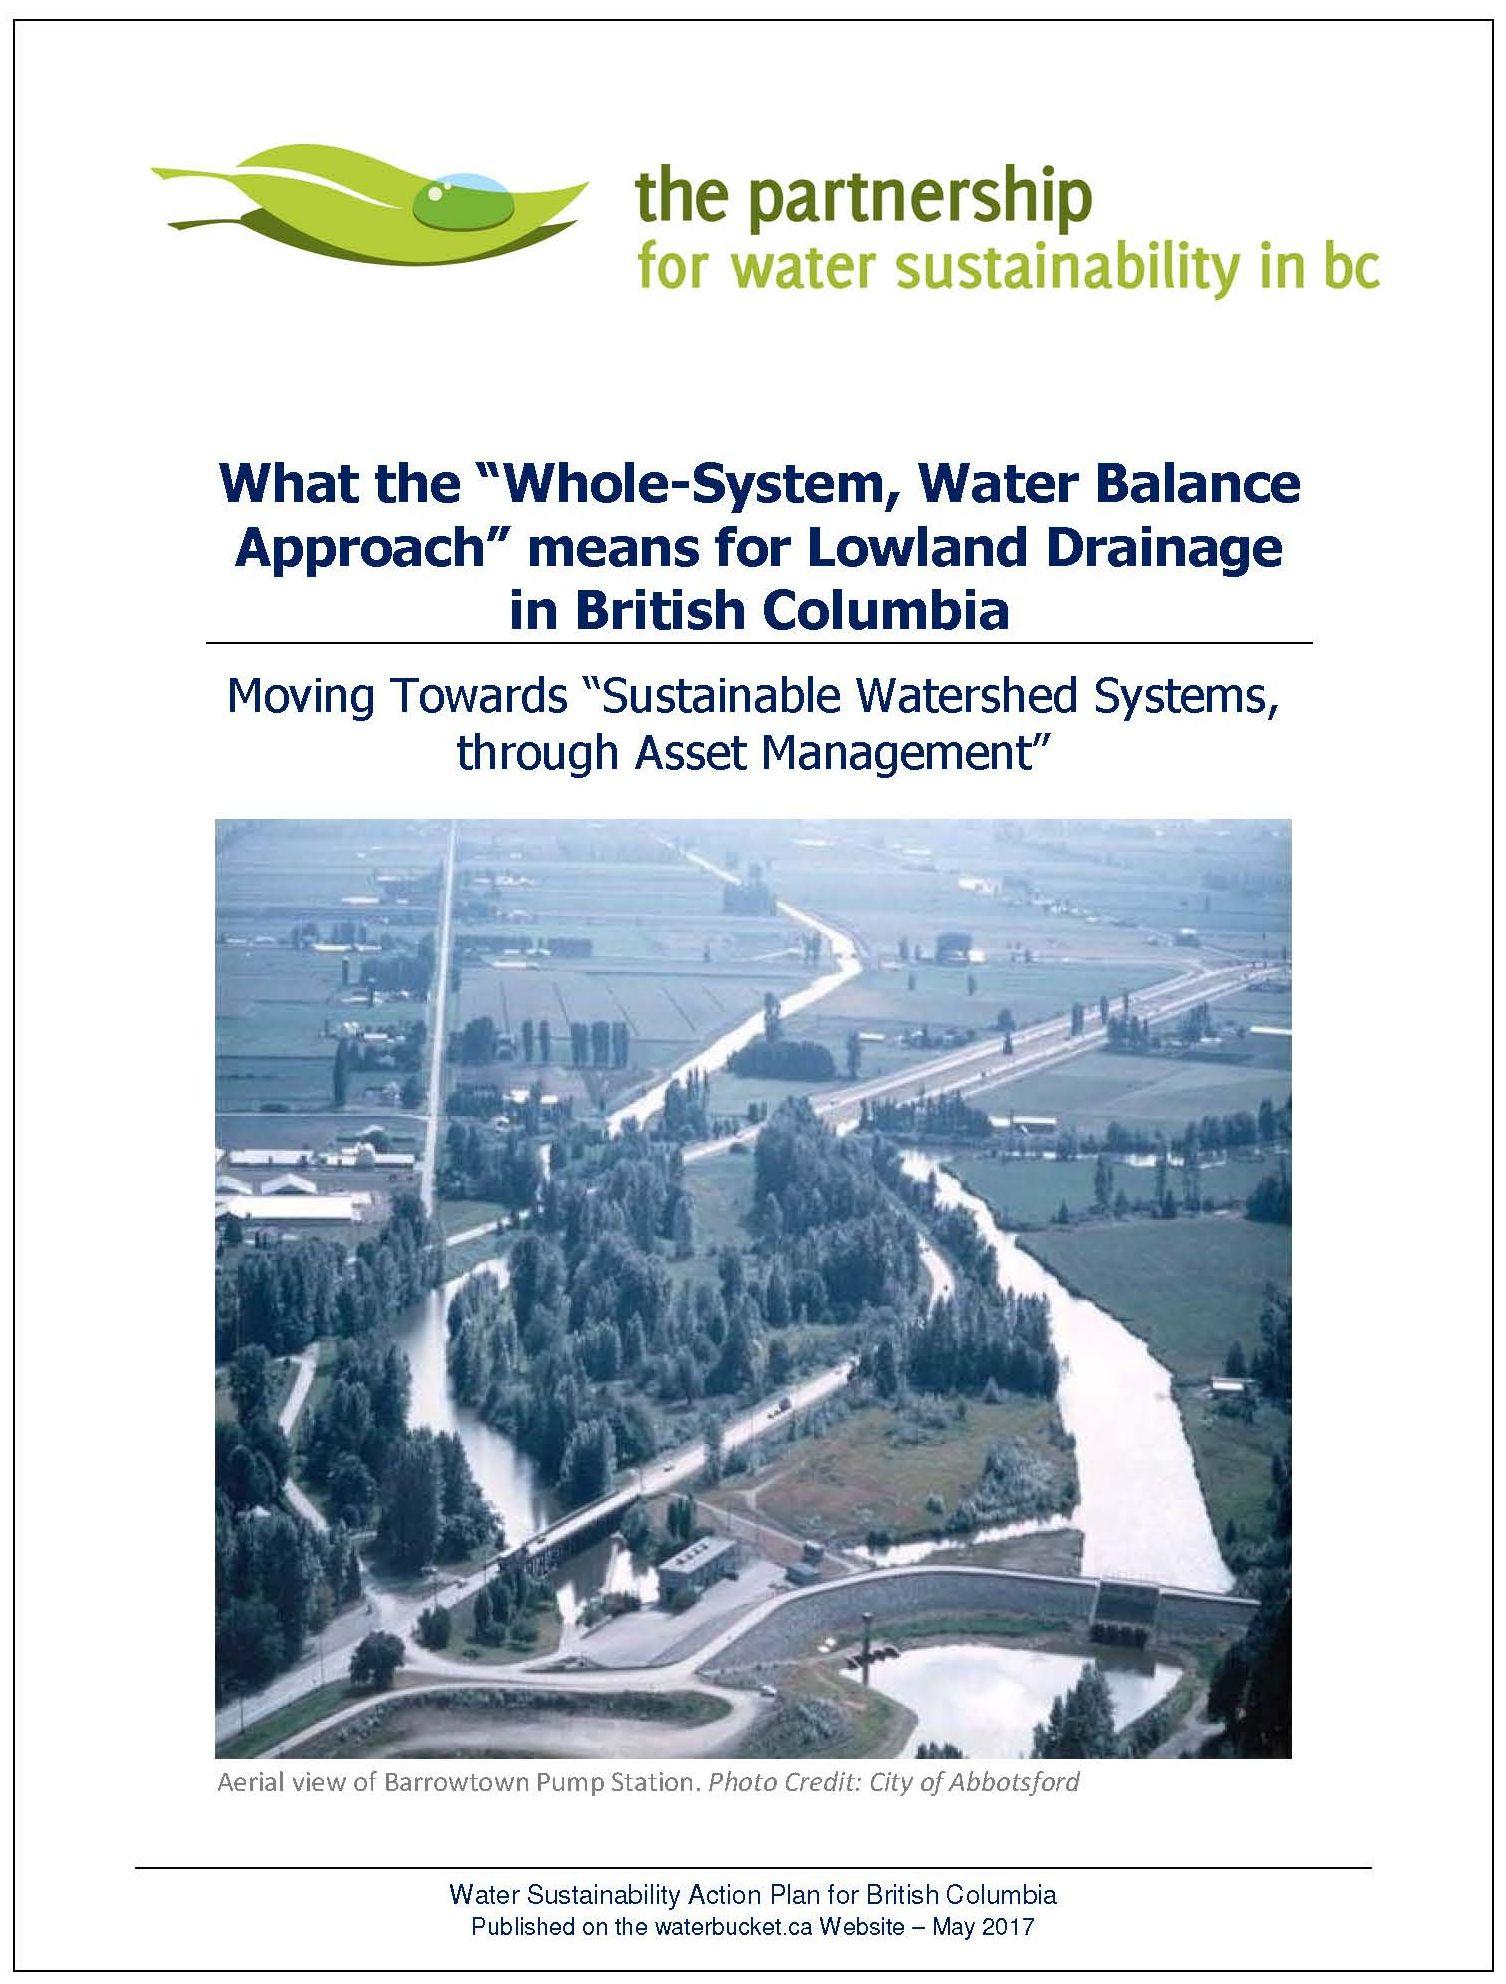 PWSBC_ARDSA-lowland drainage-IREI_May2017_cover